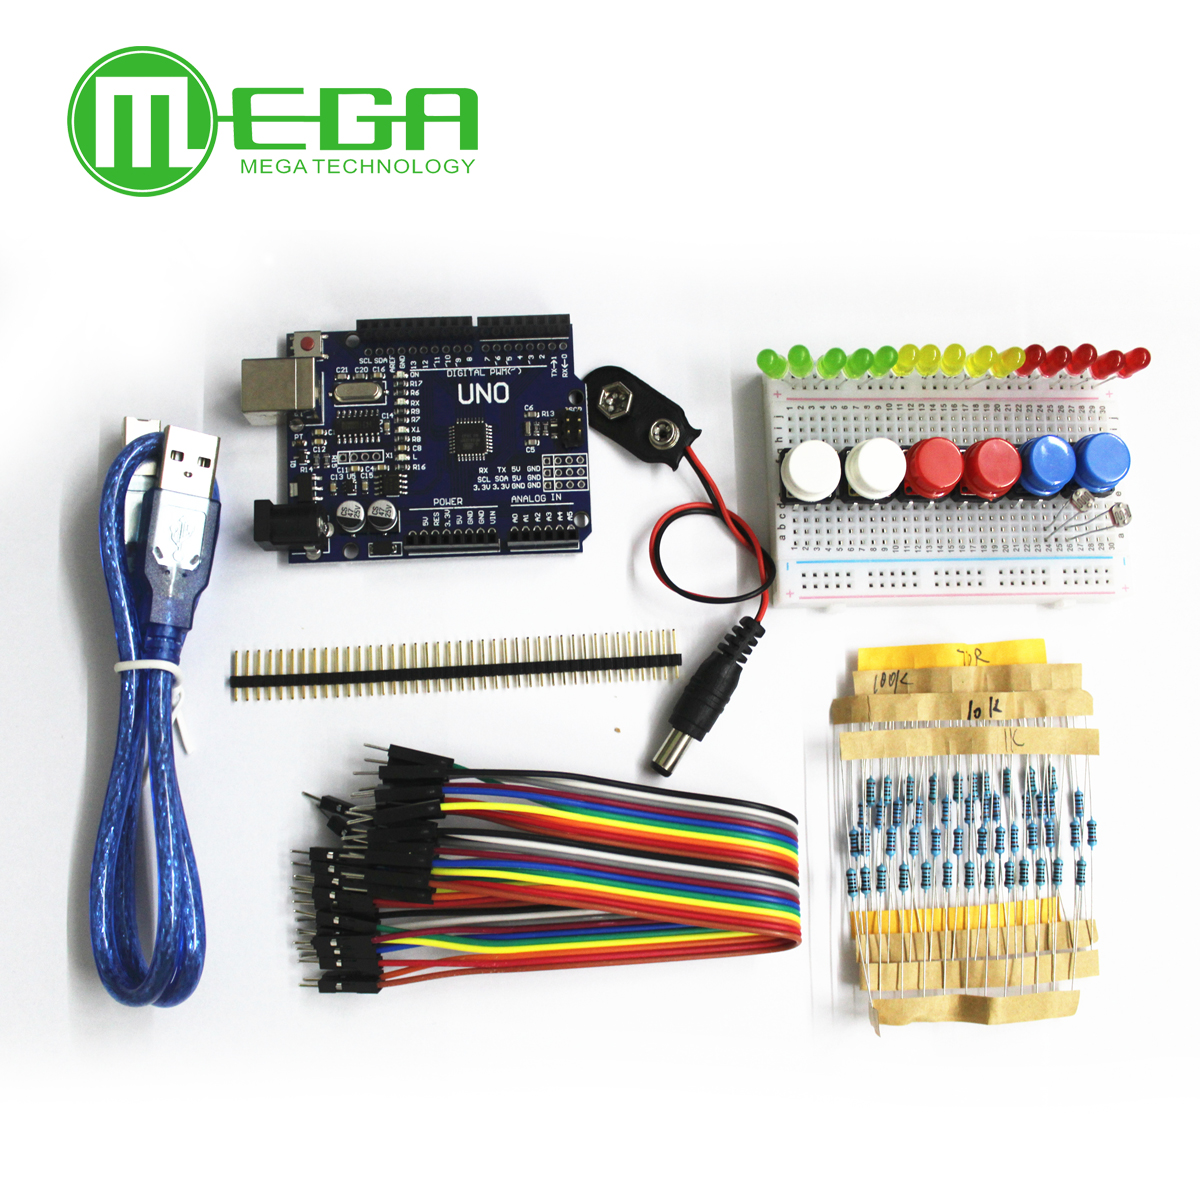 1 satz neue Starter Kit UNO R3 mini Breadboard LED jumper draht taste für Arduino compatile